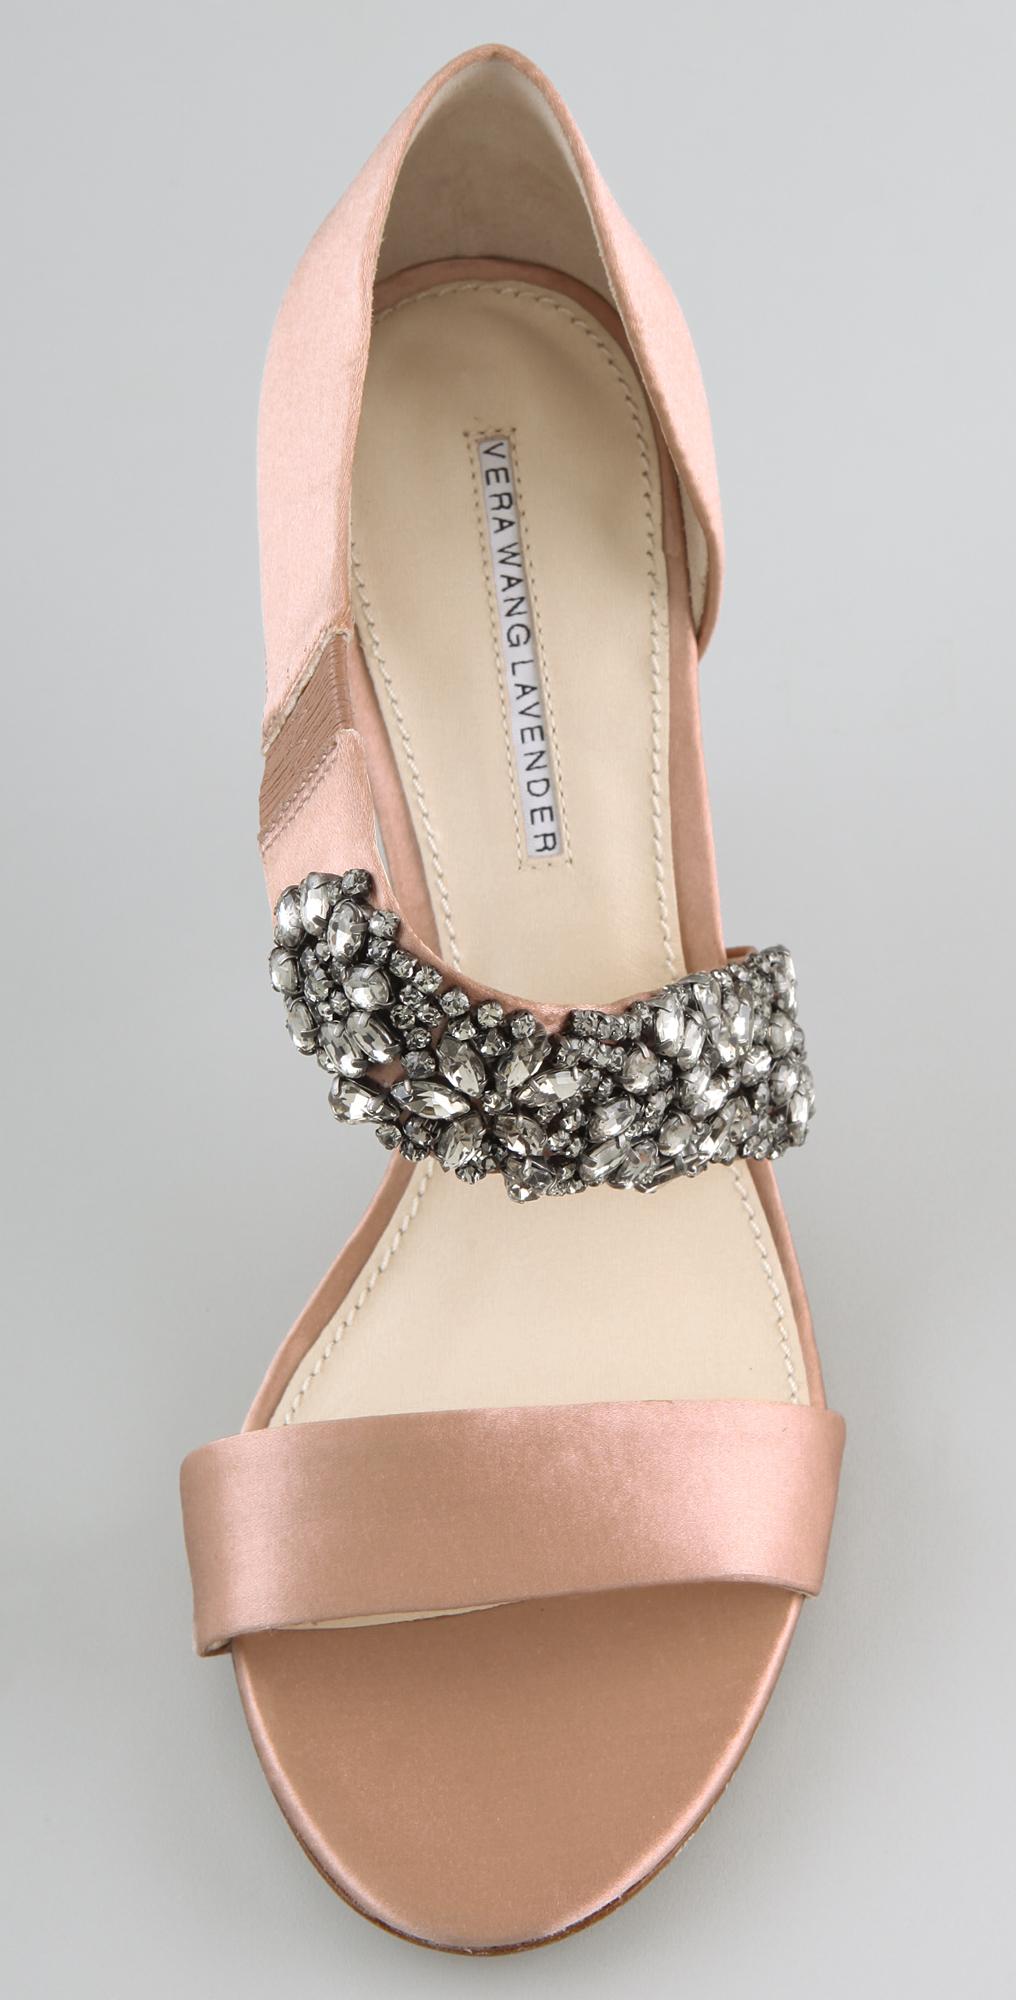 Lavender sandals shoes - Lavender Sandals Shoes 3